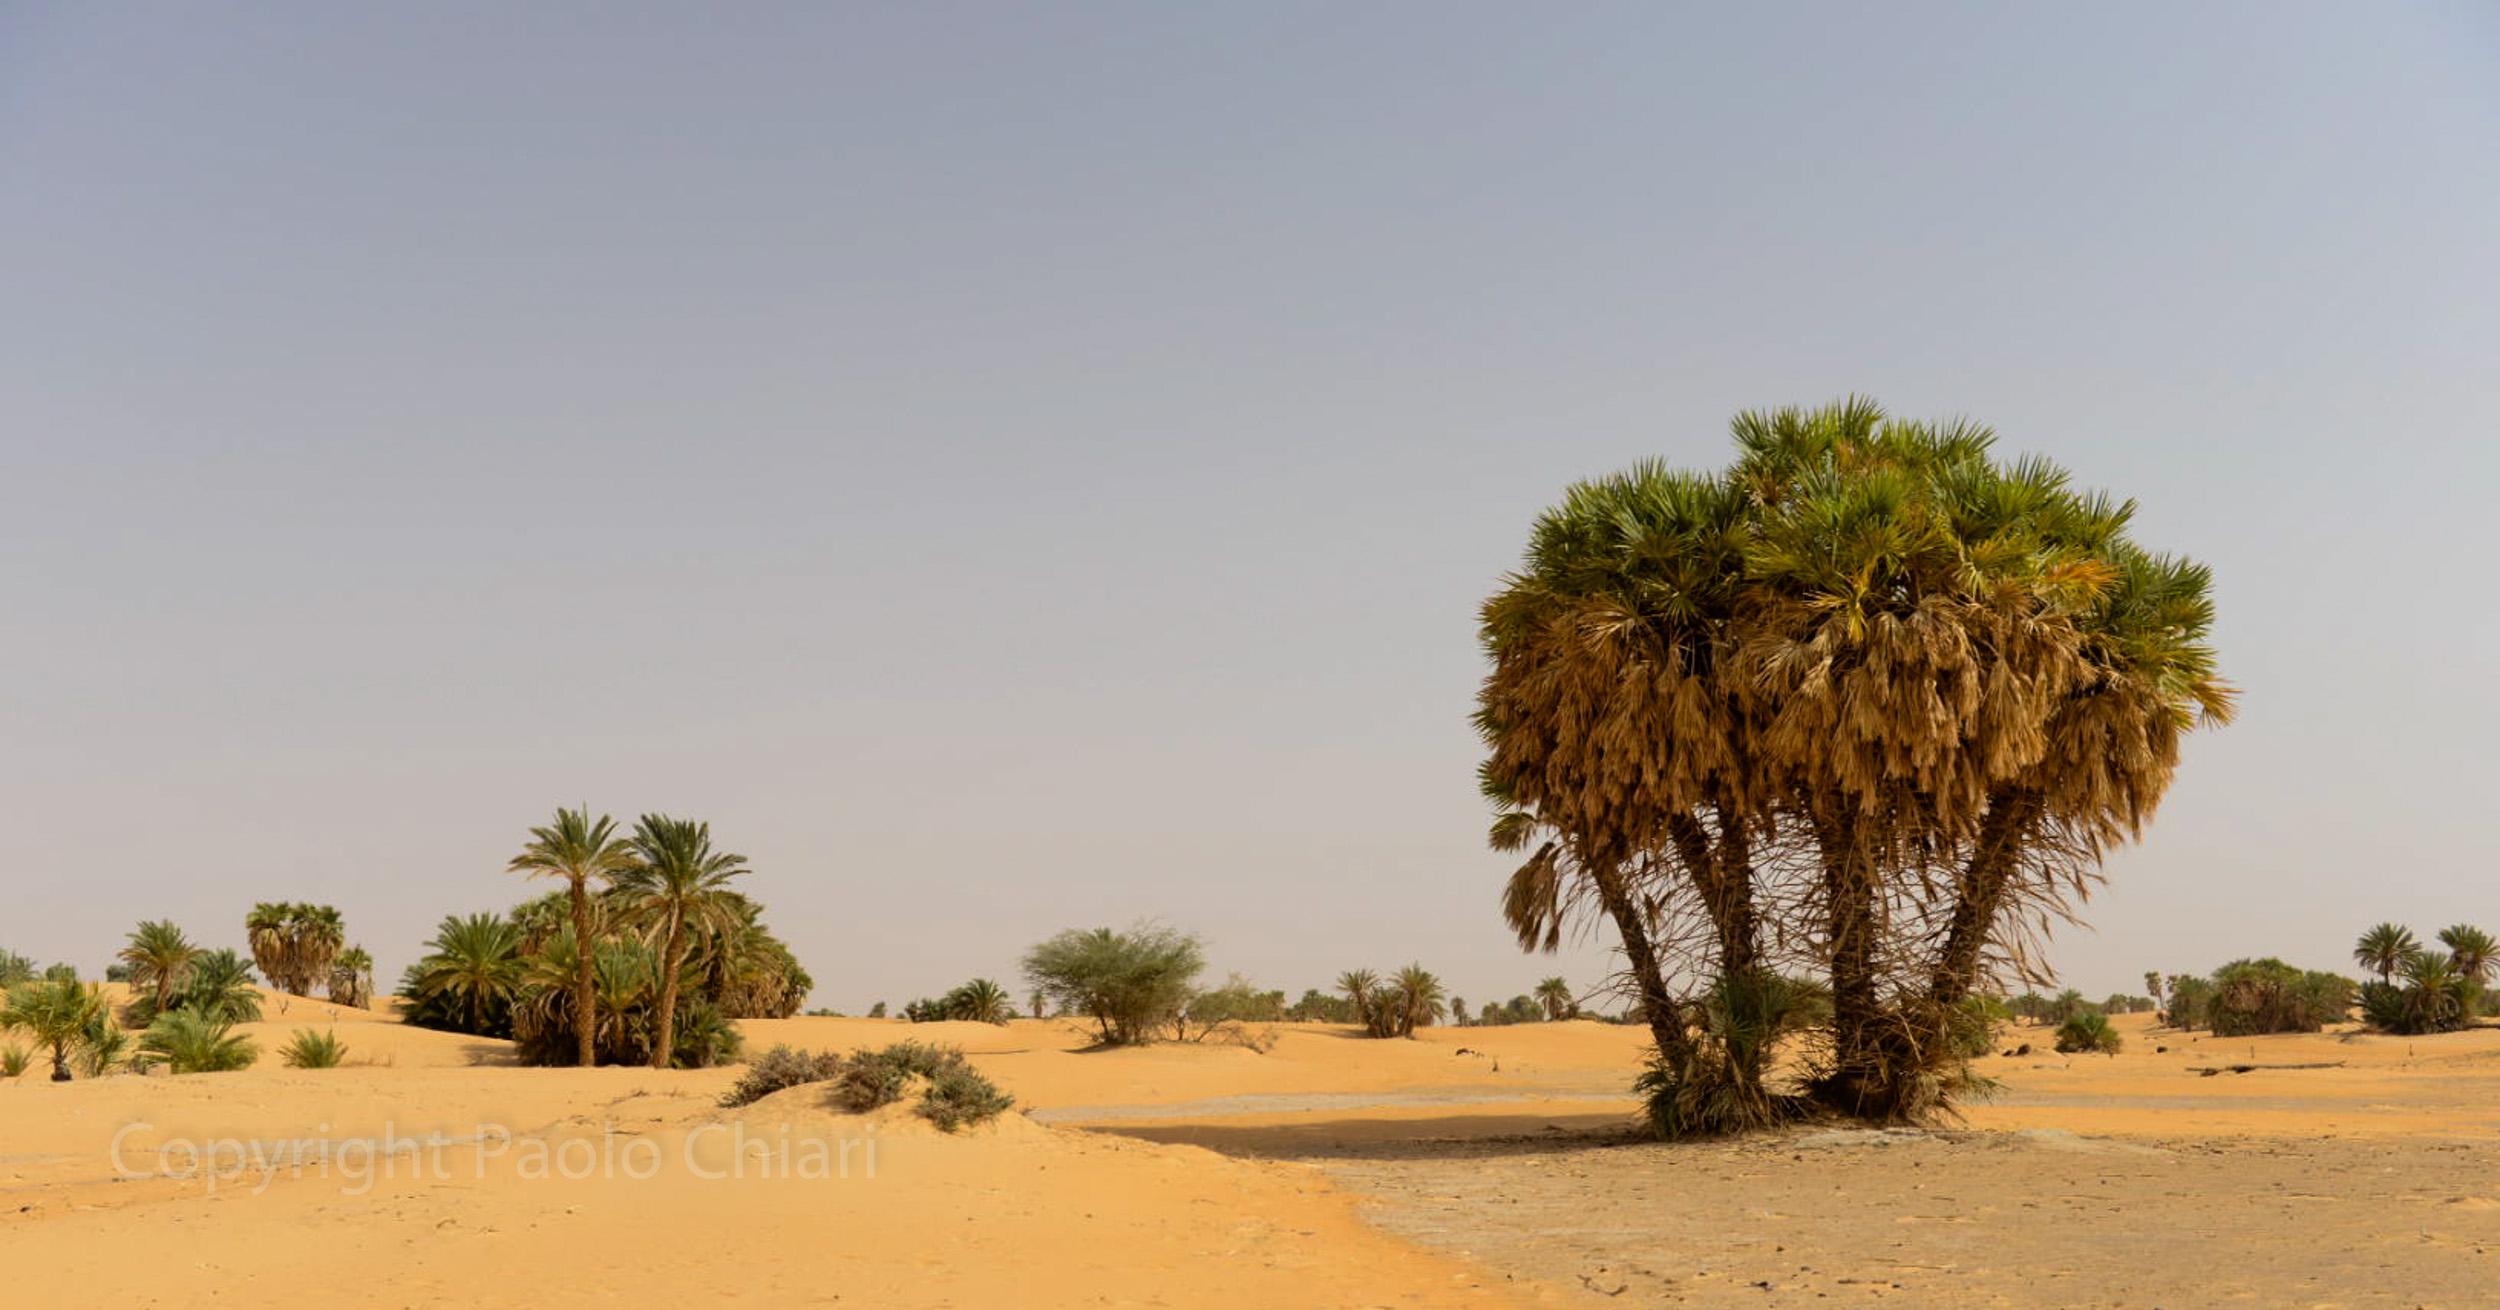 Sudan2013_1856